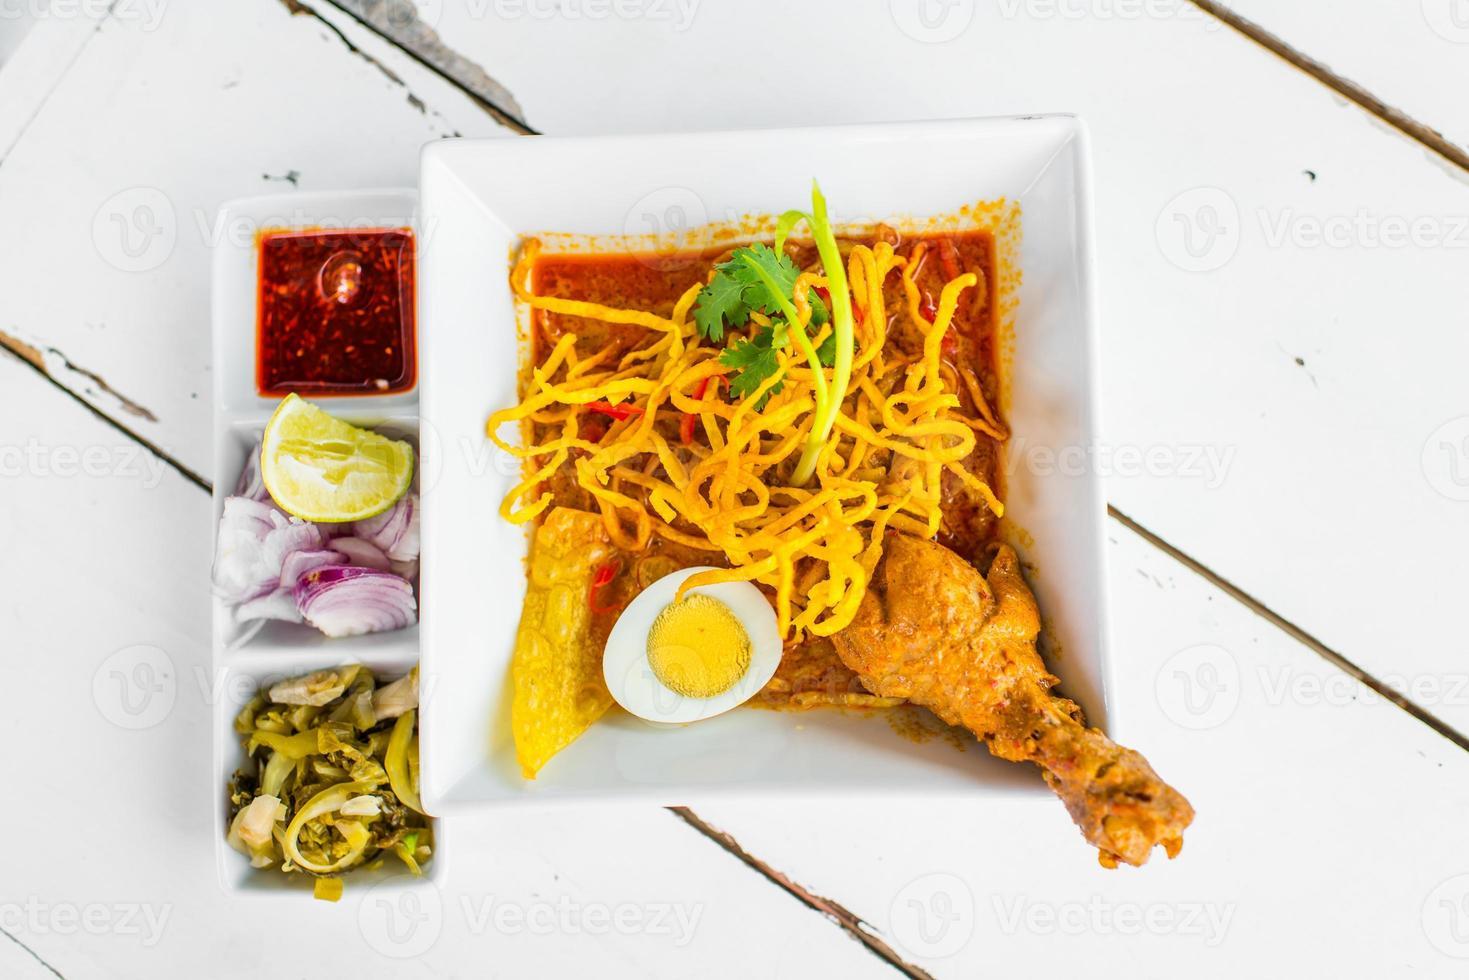 khao soi - comida tradicional tailandesa foto